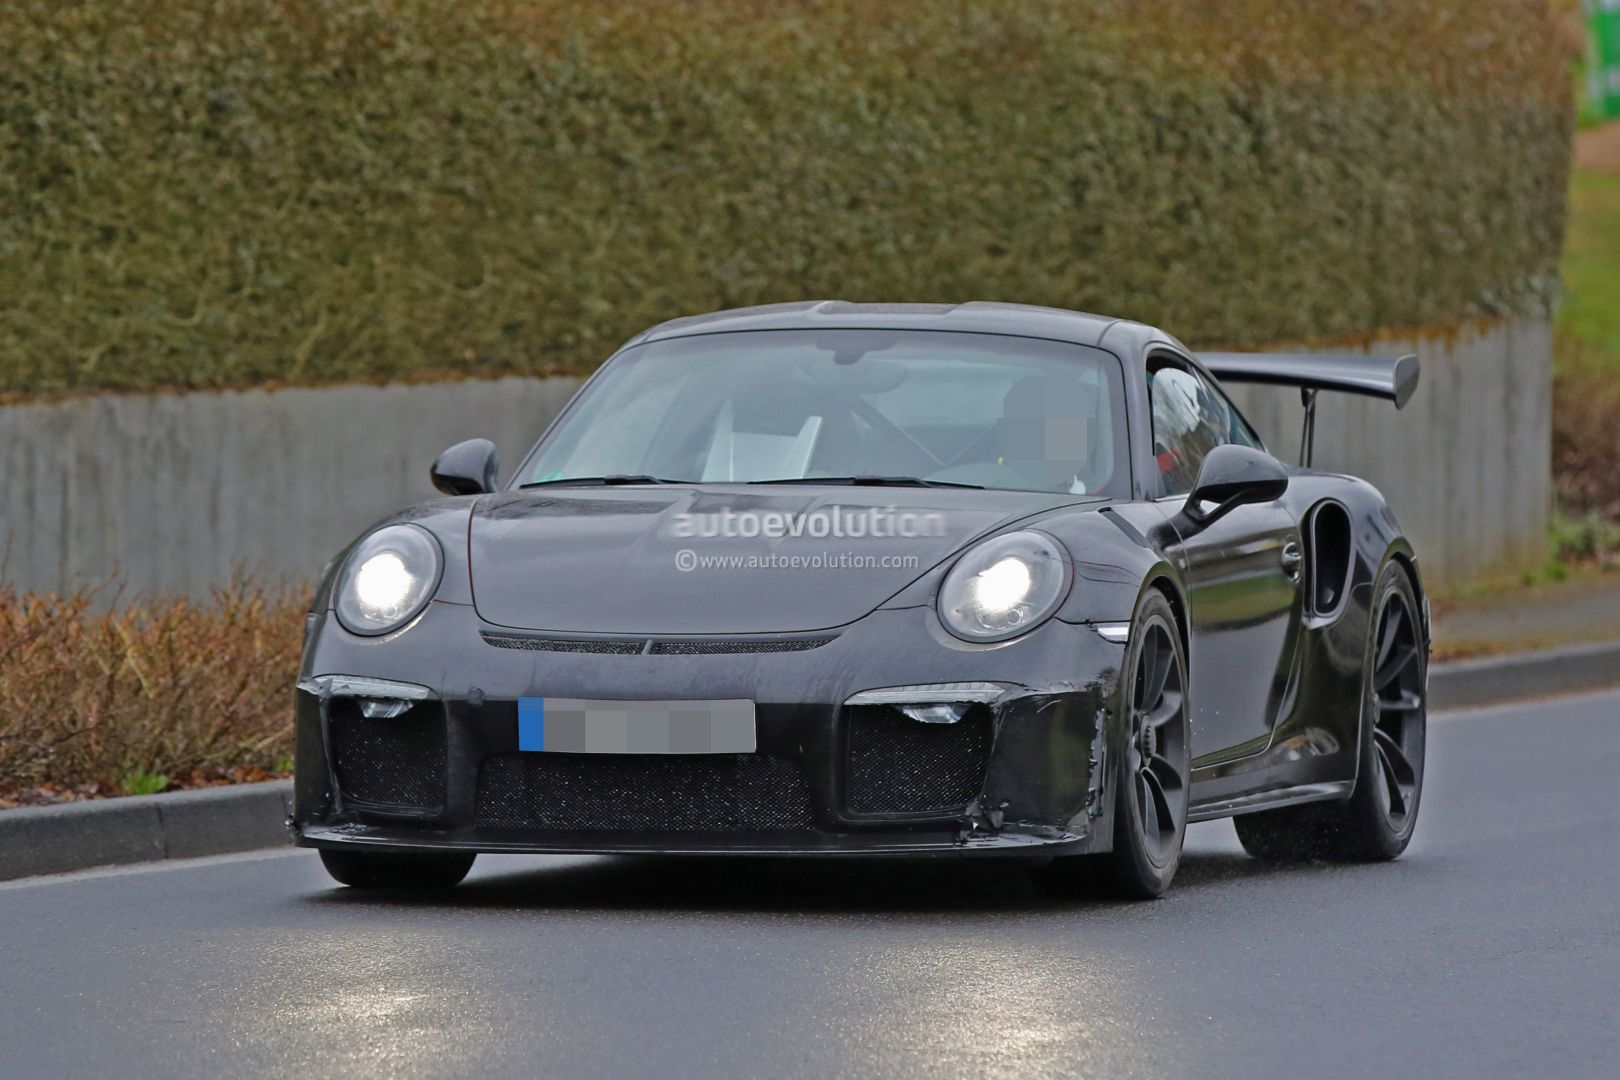 2018 porsche 911 gt3 rs spied has 4 2l engine 911 r like rear diffuser autoevolution